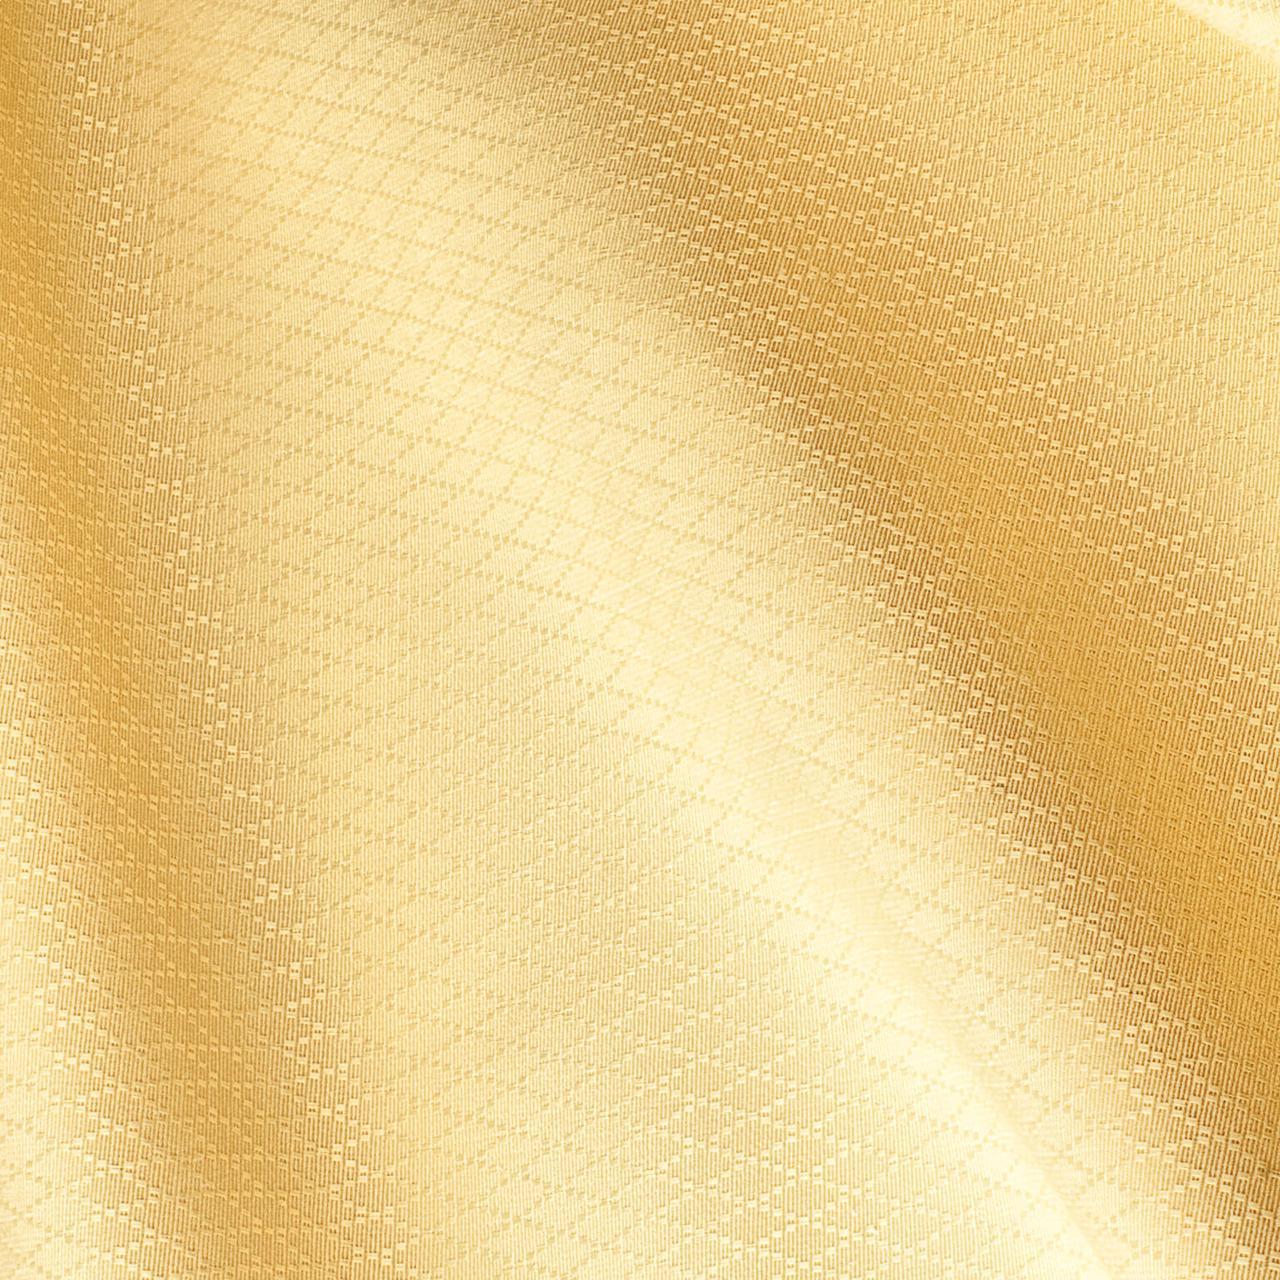 Ткань для скатертей и салфеток (ресторан) 400289 v3